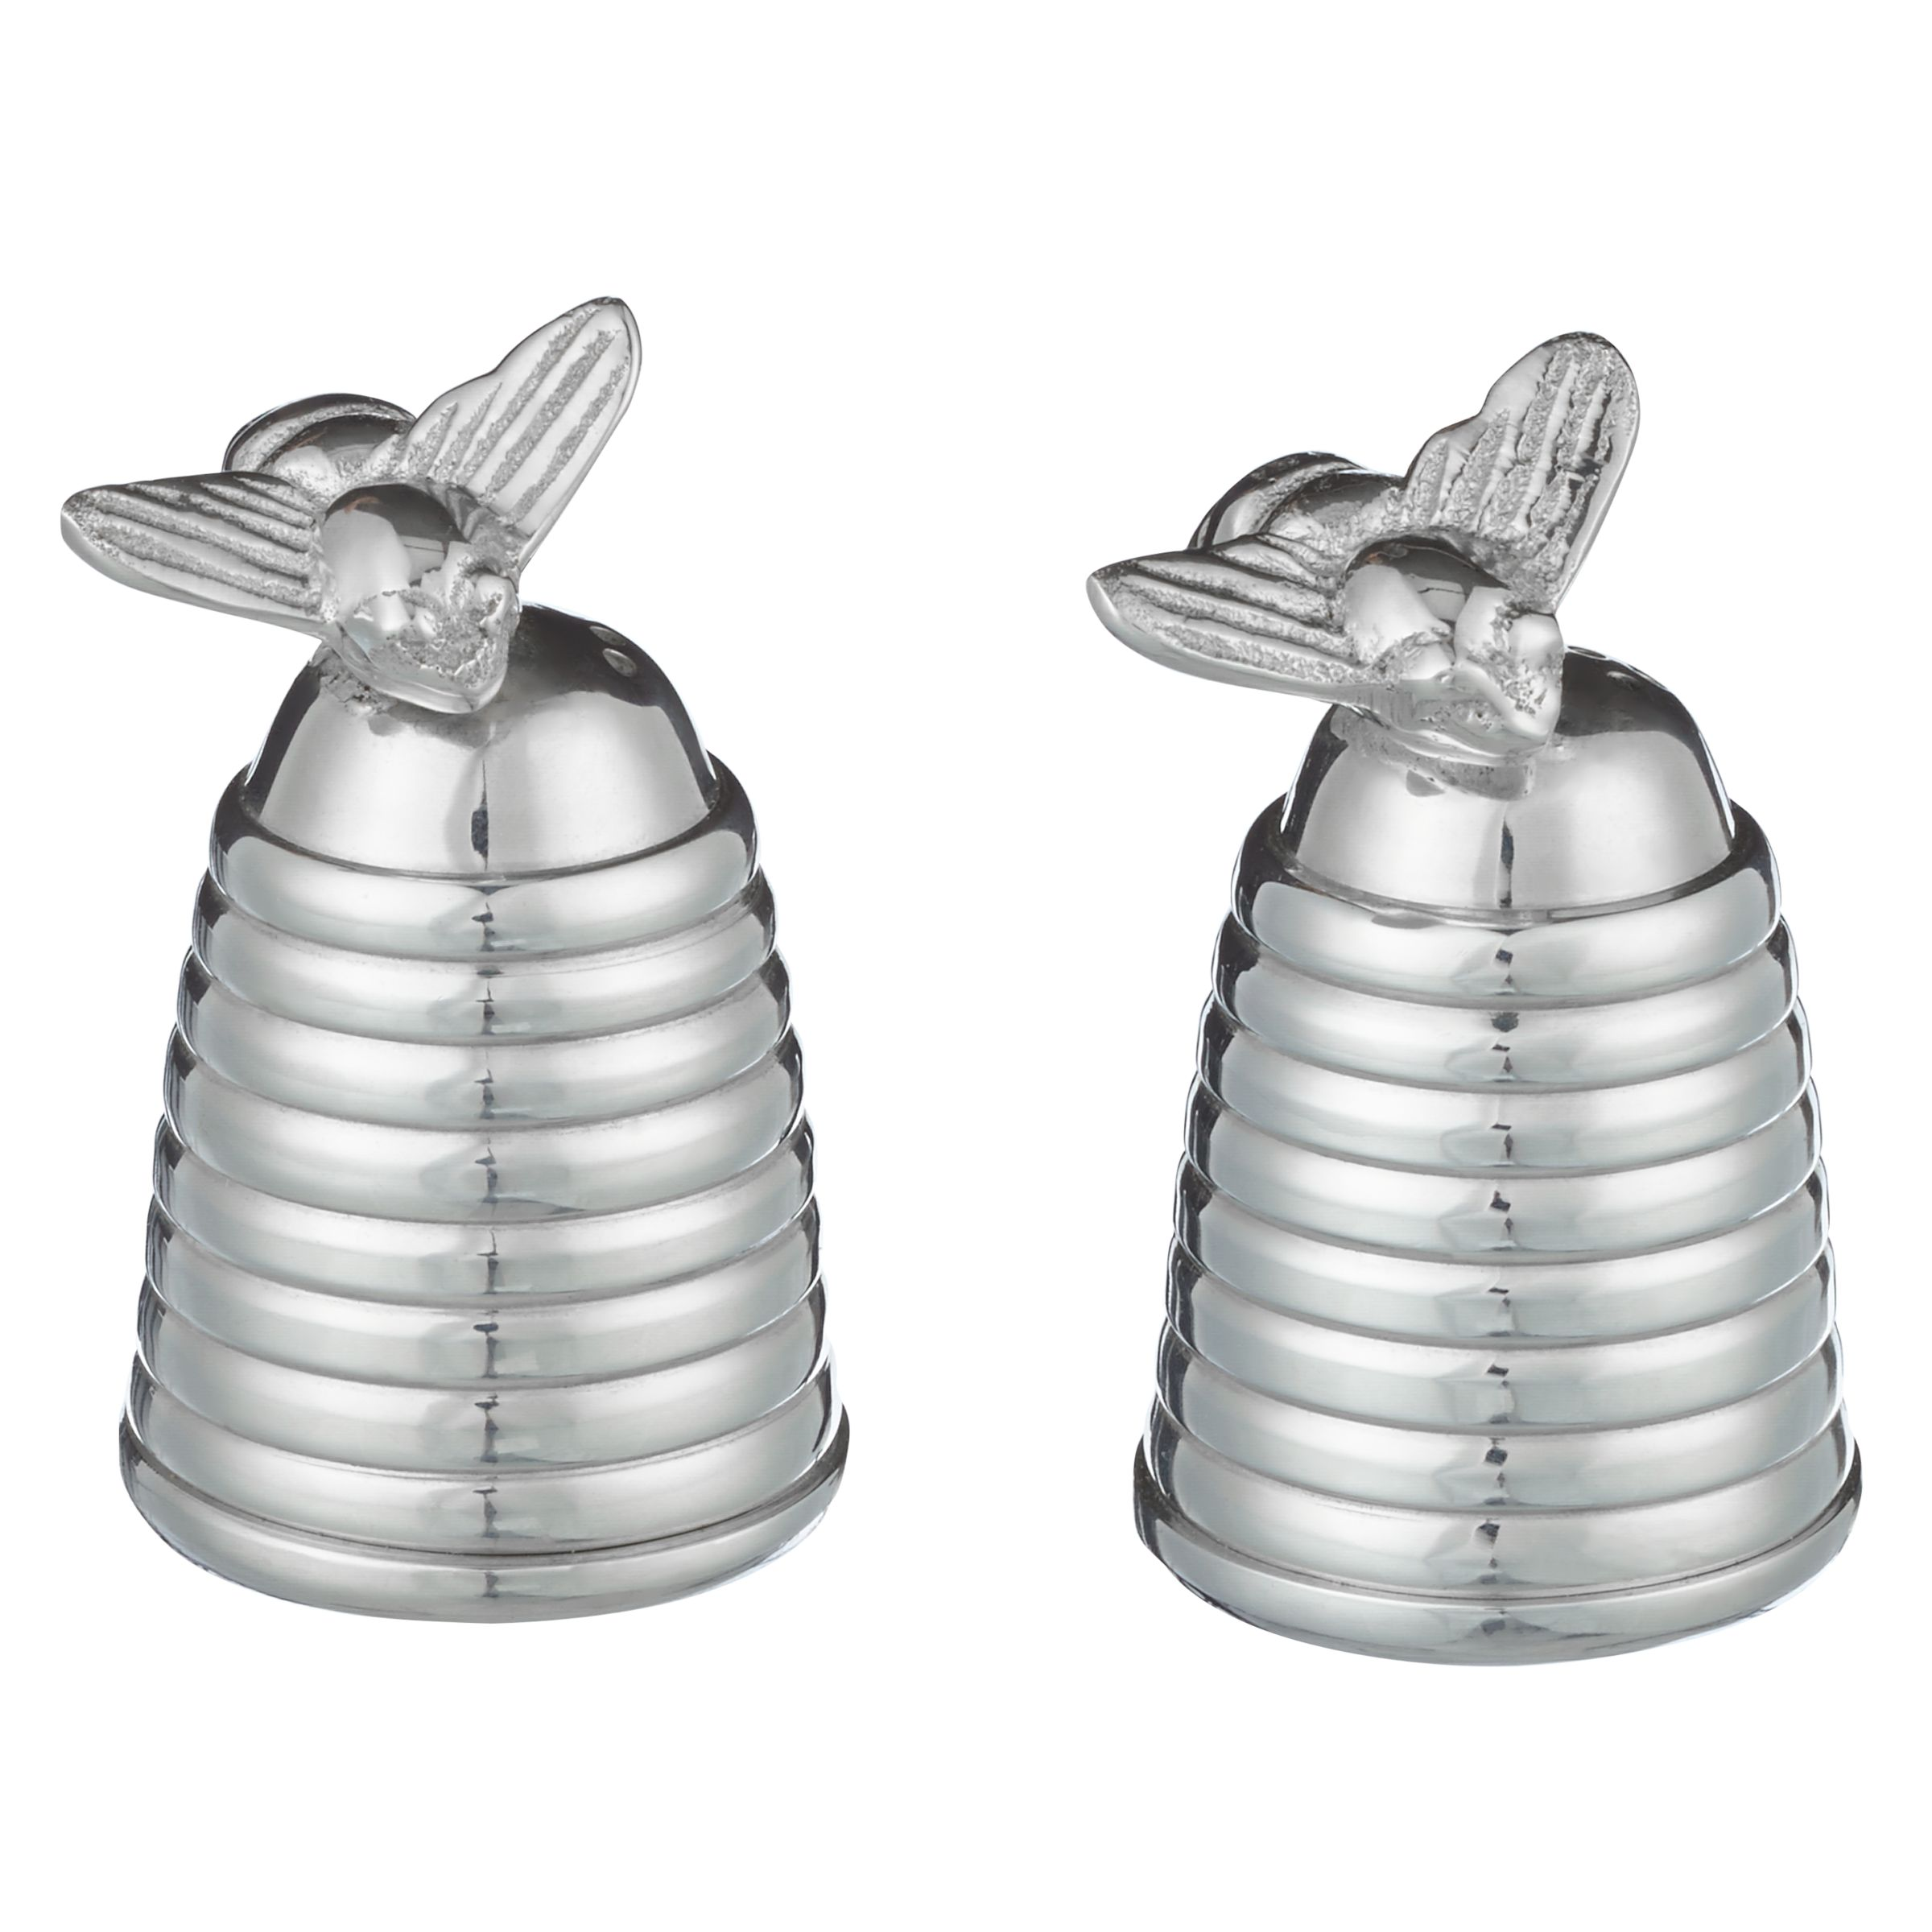 Culinary Concepts Culinary Concepts Silver Plated Honey Bee Hive Salt & Pepper Cruet Set